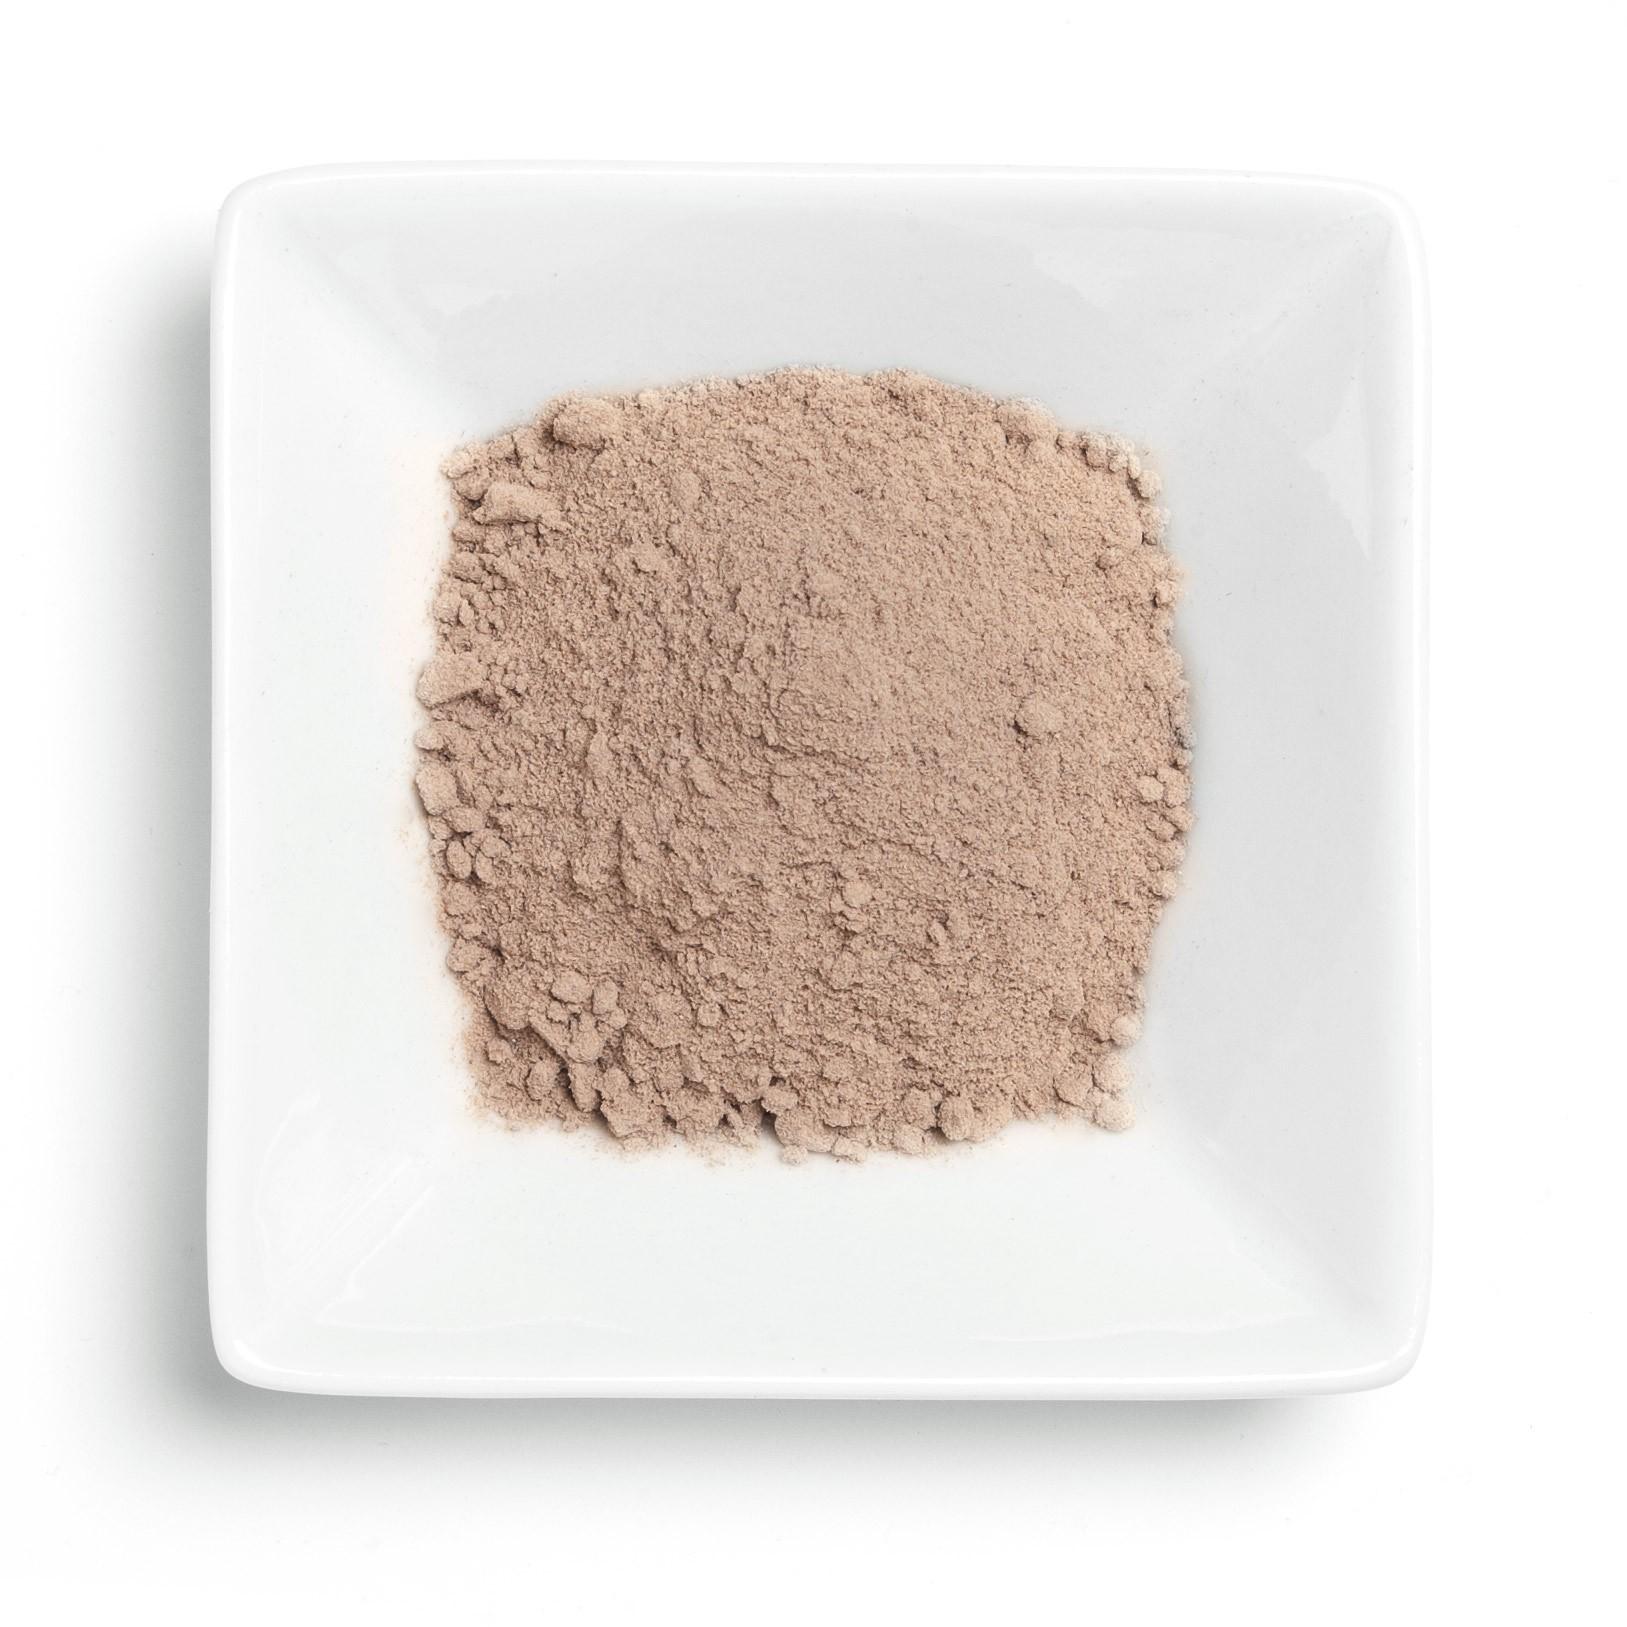 Instant Kava Kava - 40% Kavain Quick Kava - Piper methysticum